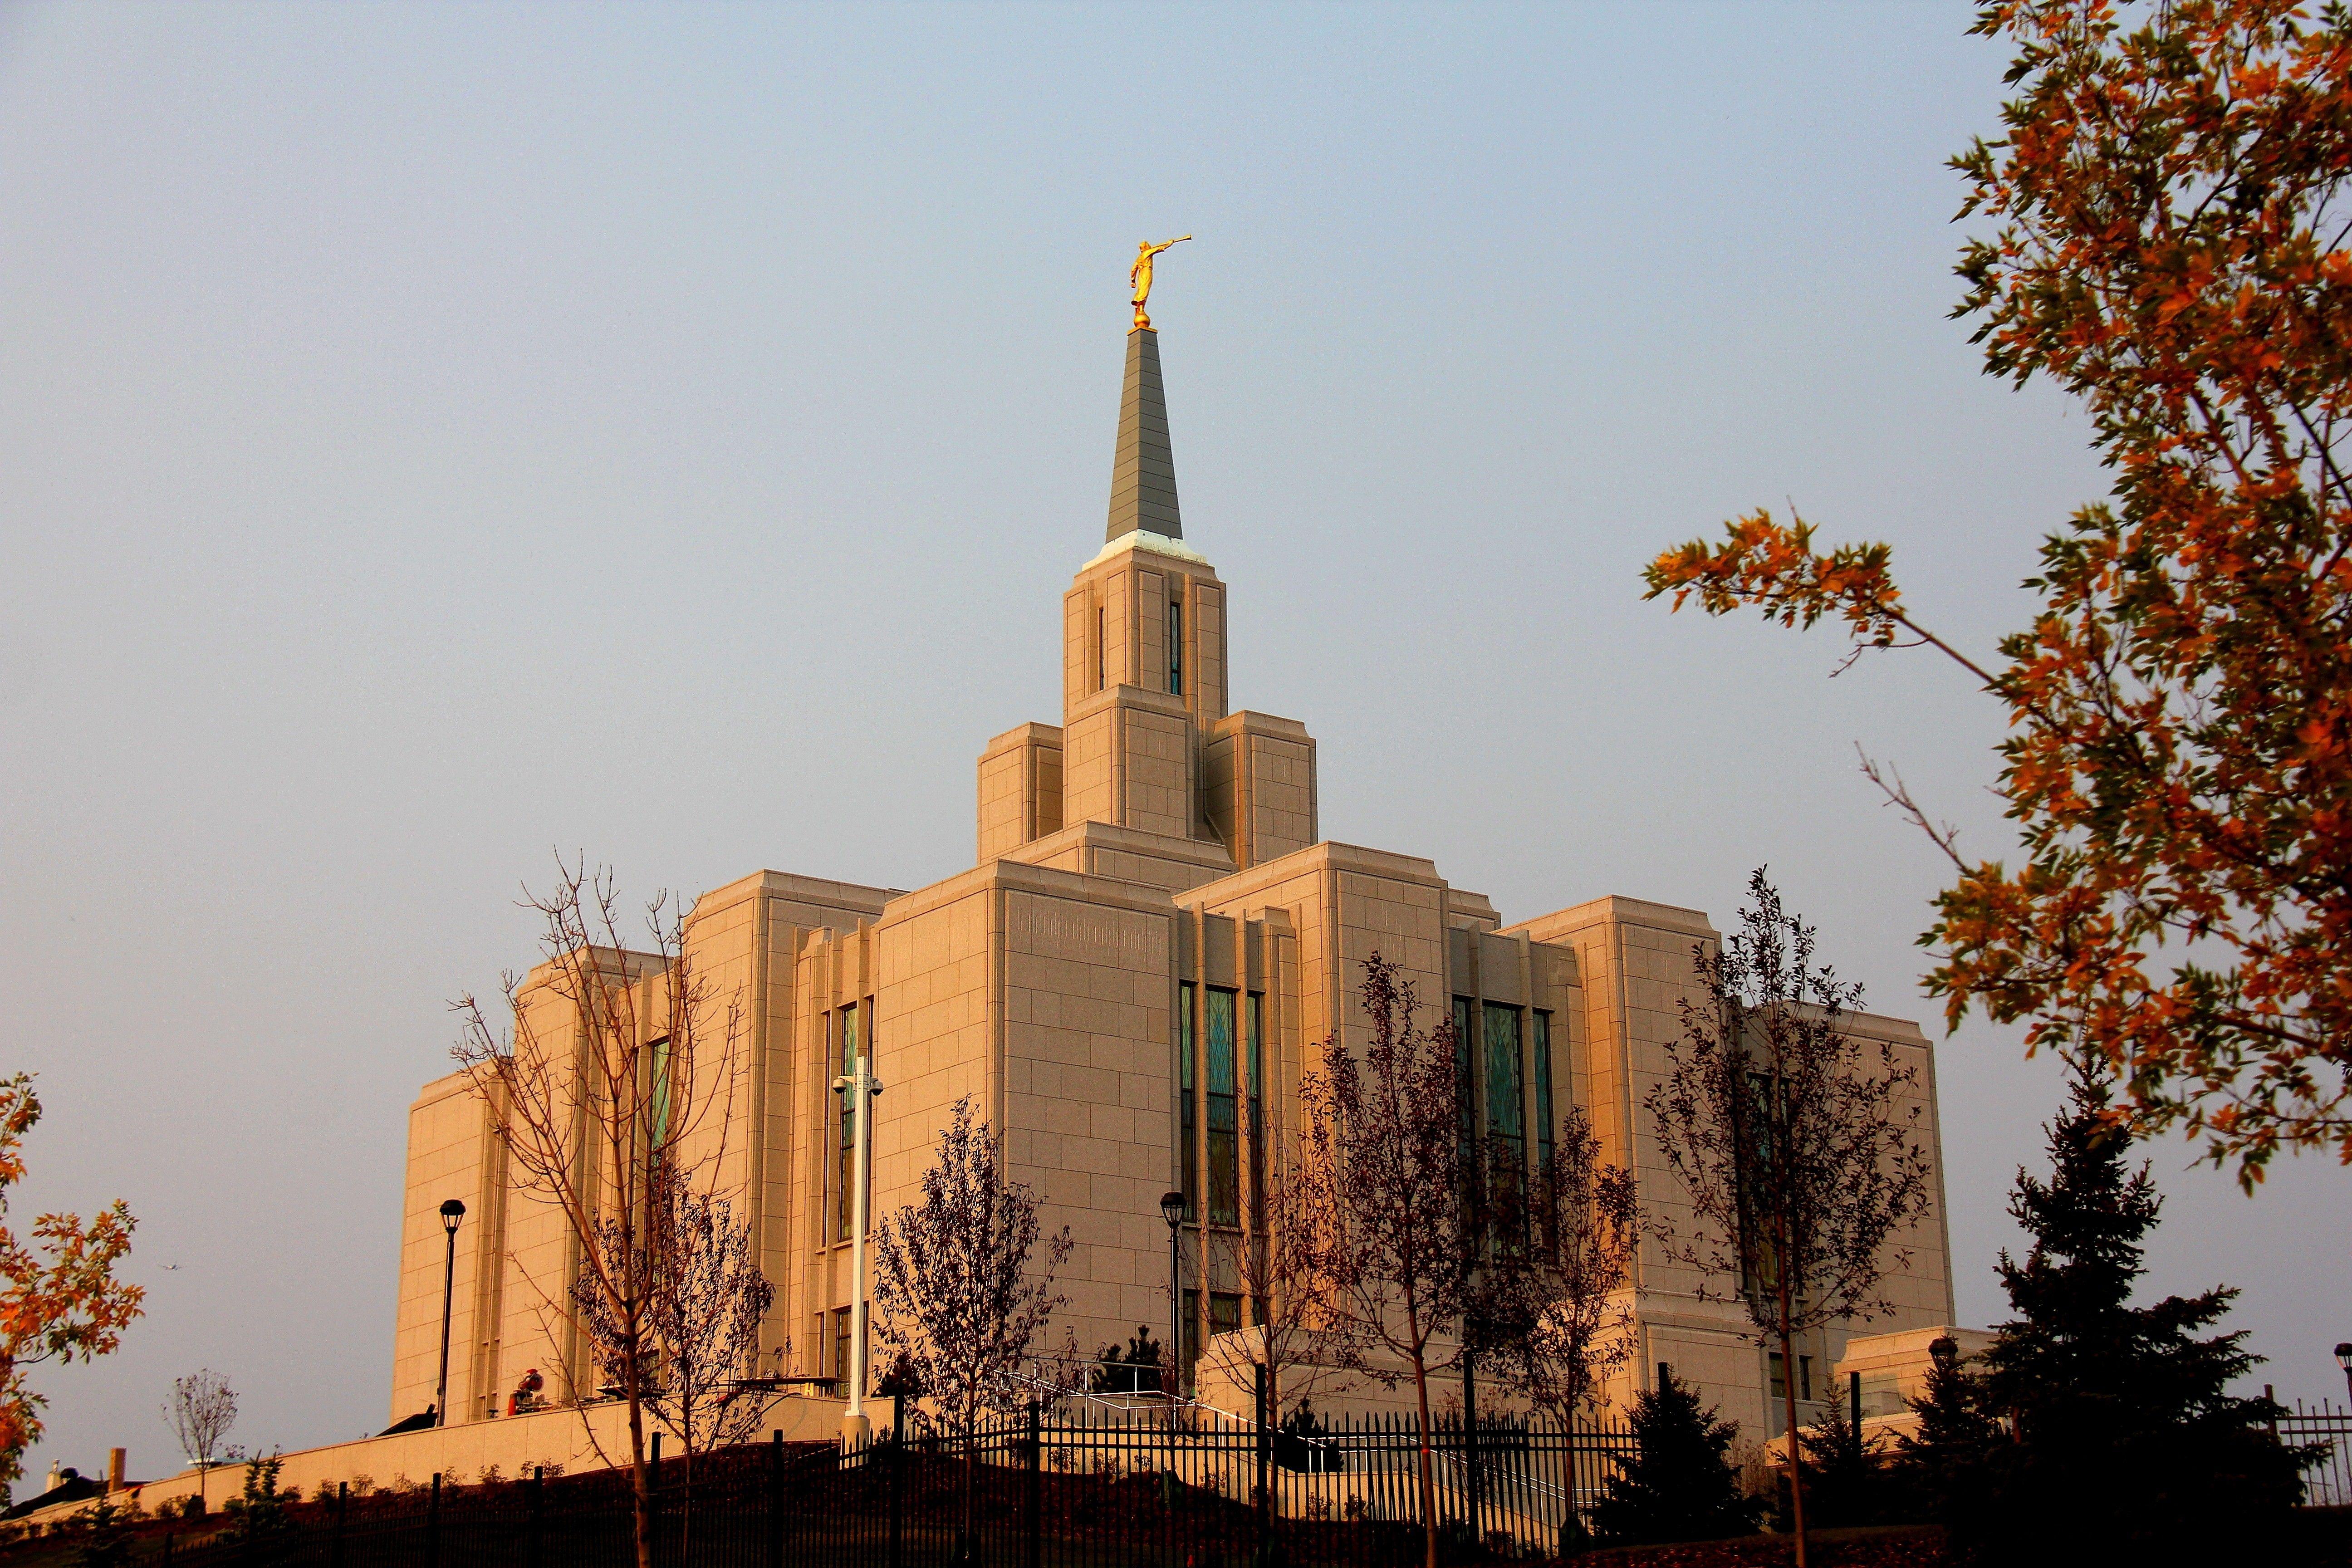 The Calgary Alberta Temple during the autumn season.